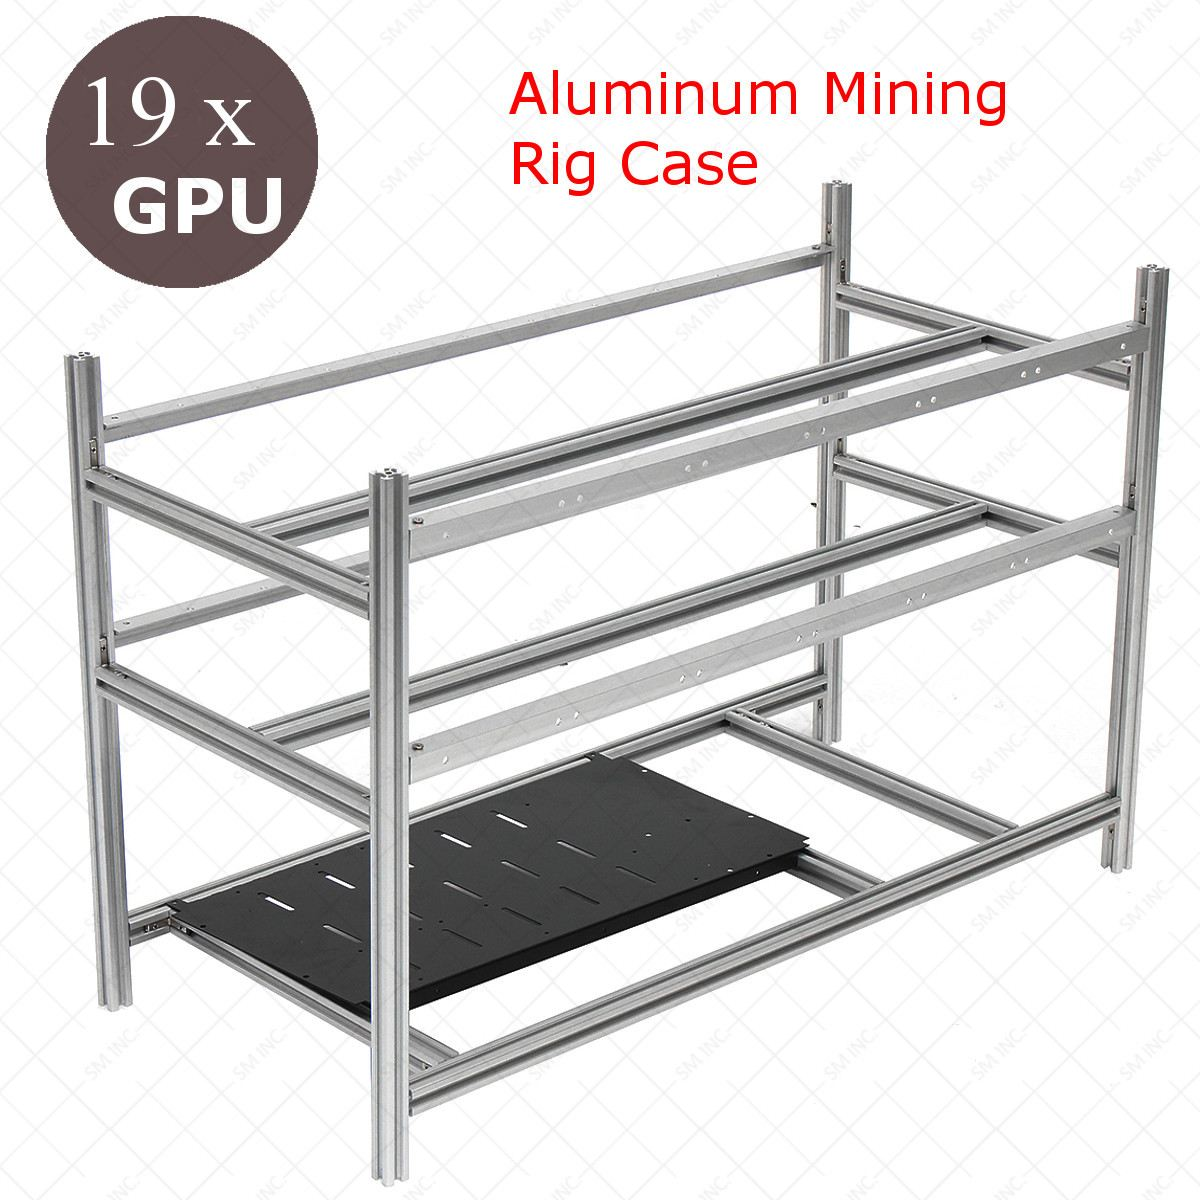 Stackable Open Air Mining Rig Frame Miner чехол для 19 GPU и т. д. BTH 3 блок питания новый компьютер Mining Case Frame Server Chassis